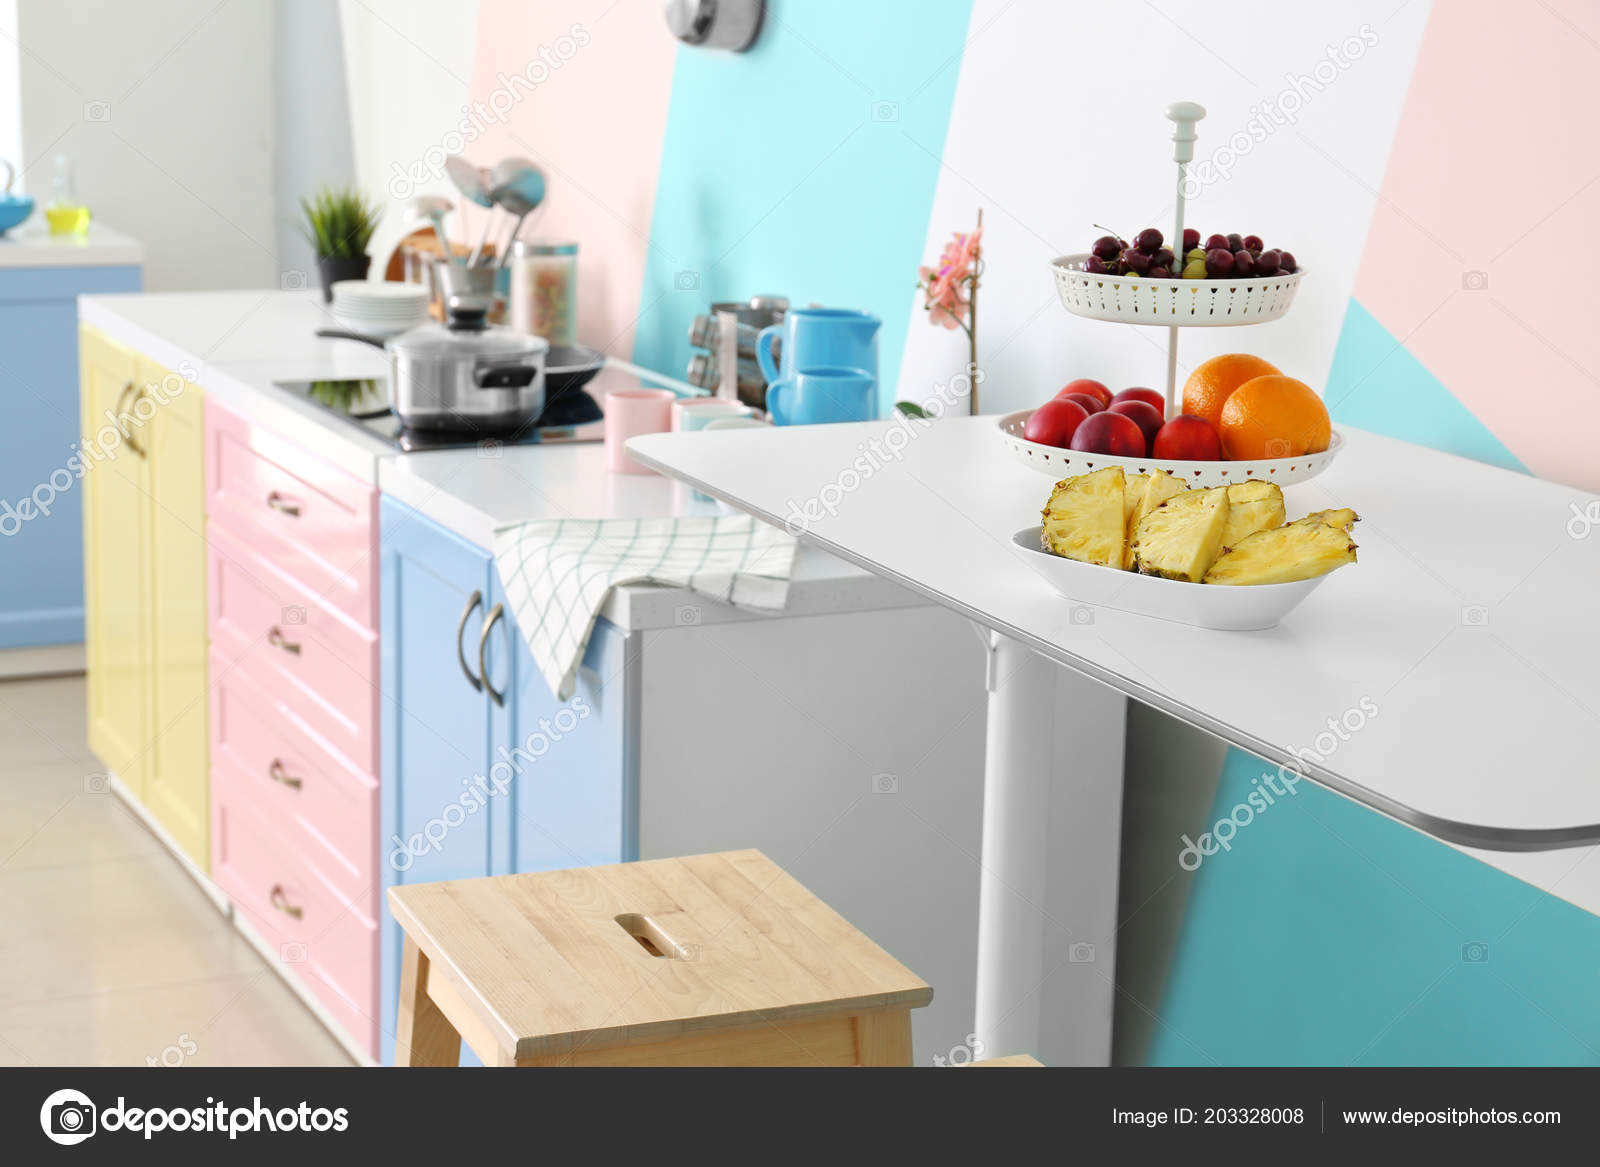 Frutas Mesa Cocina Moderna — Foto de stock © belchonock #203328008